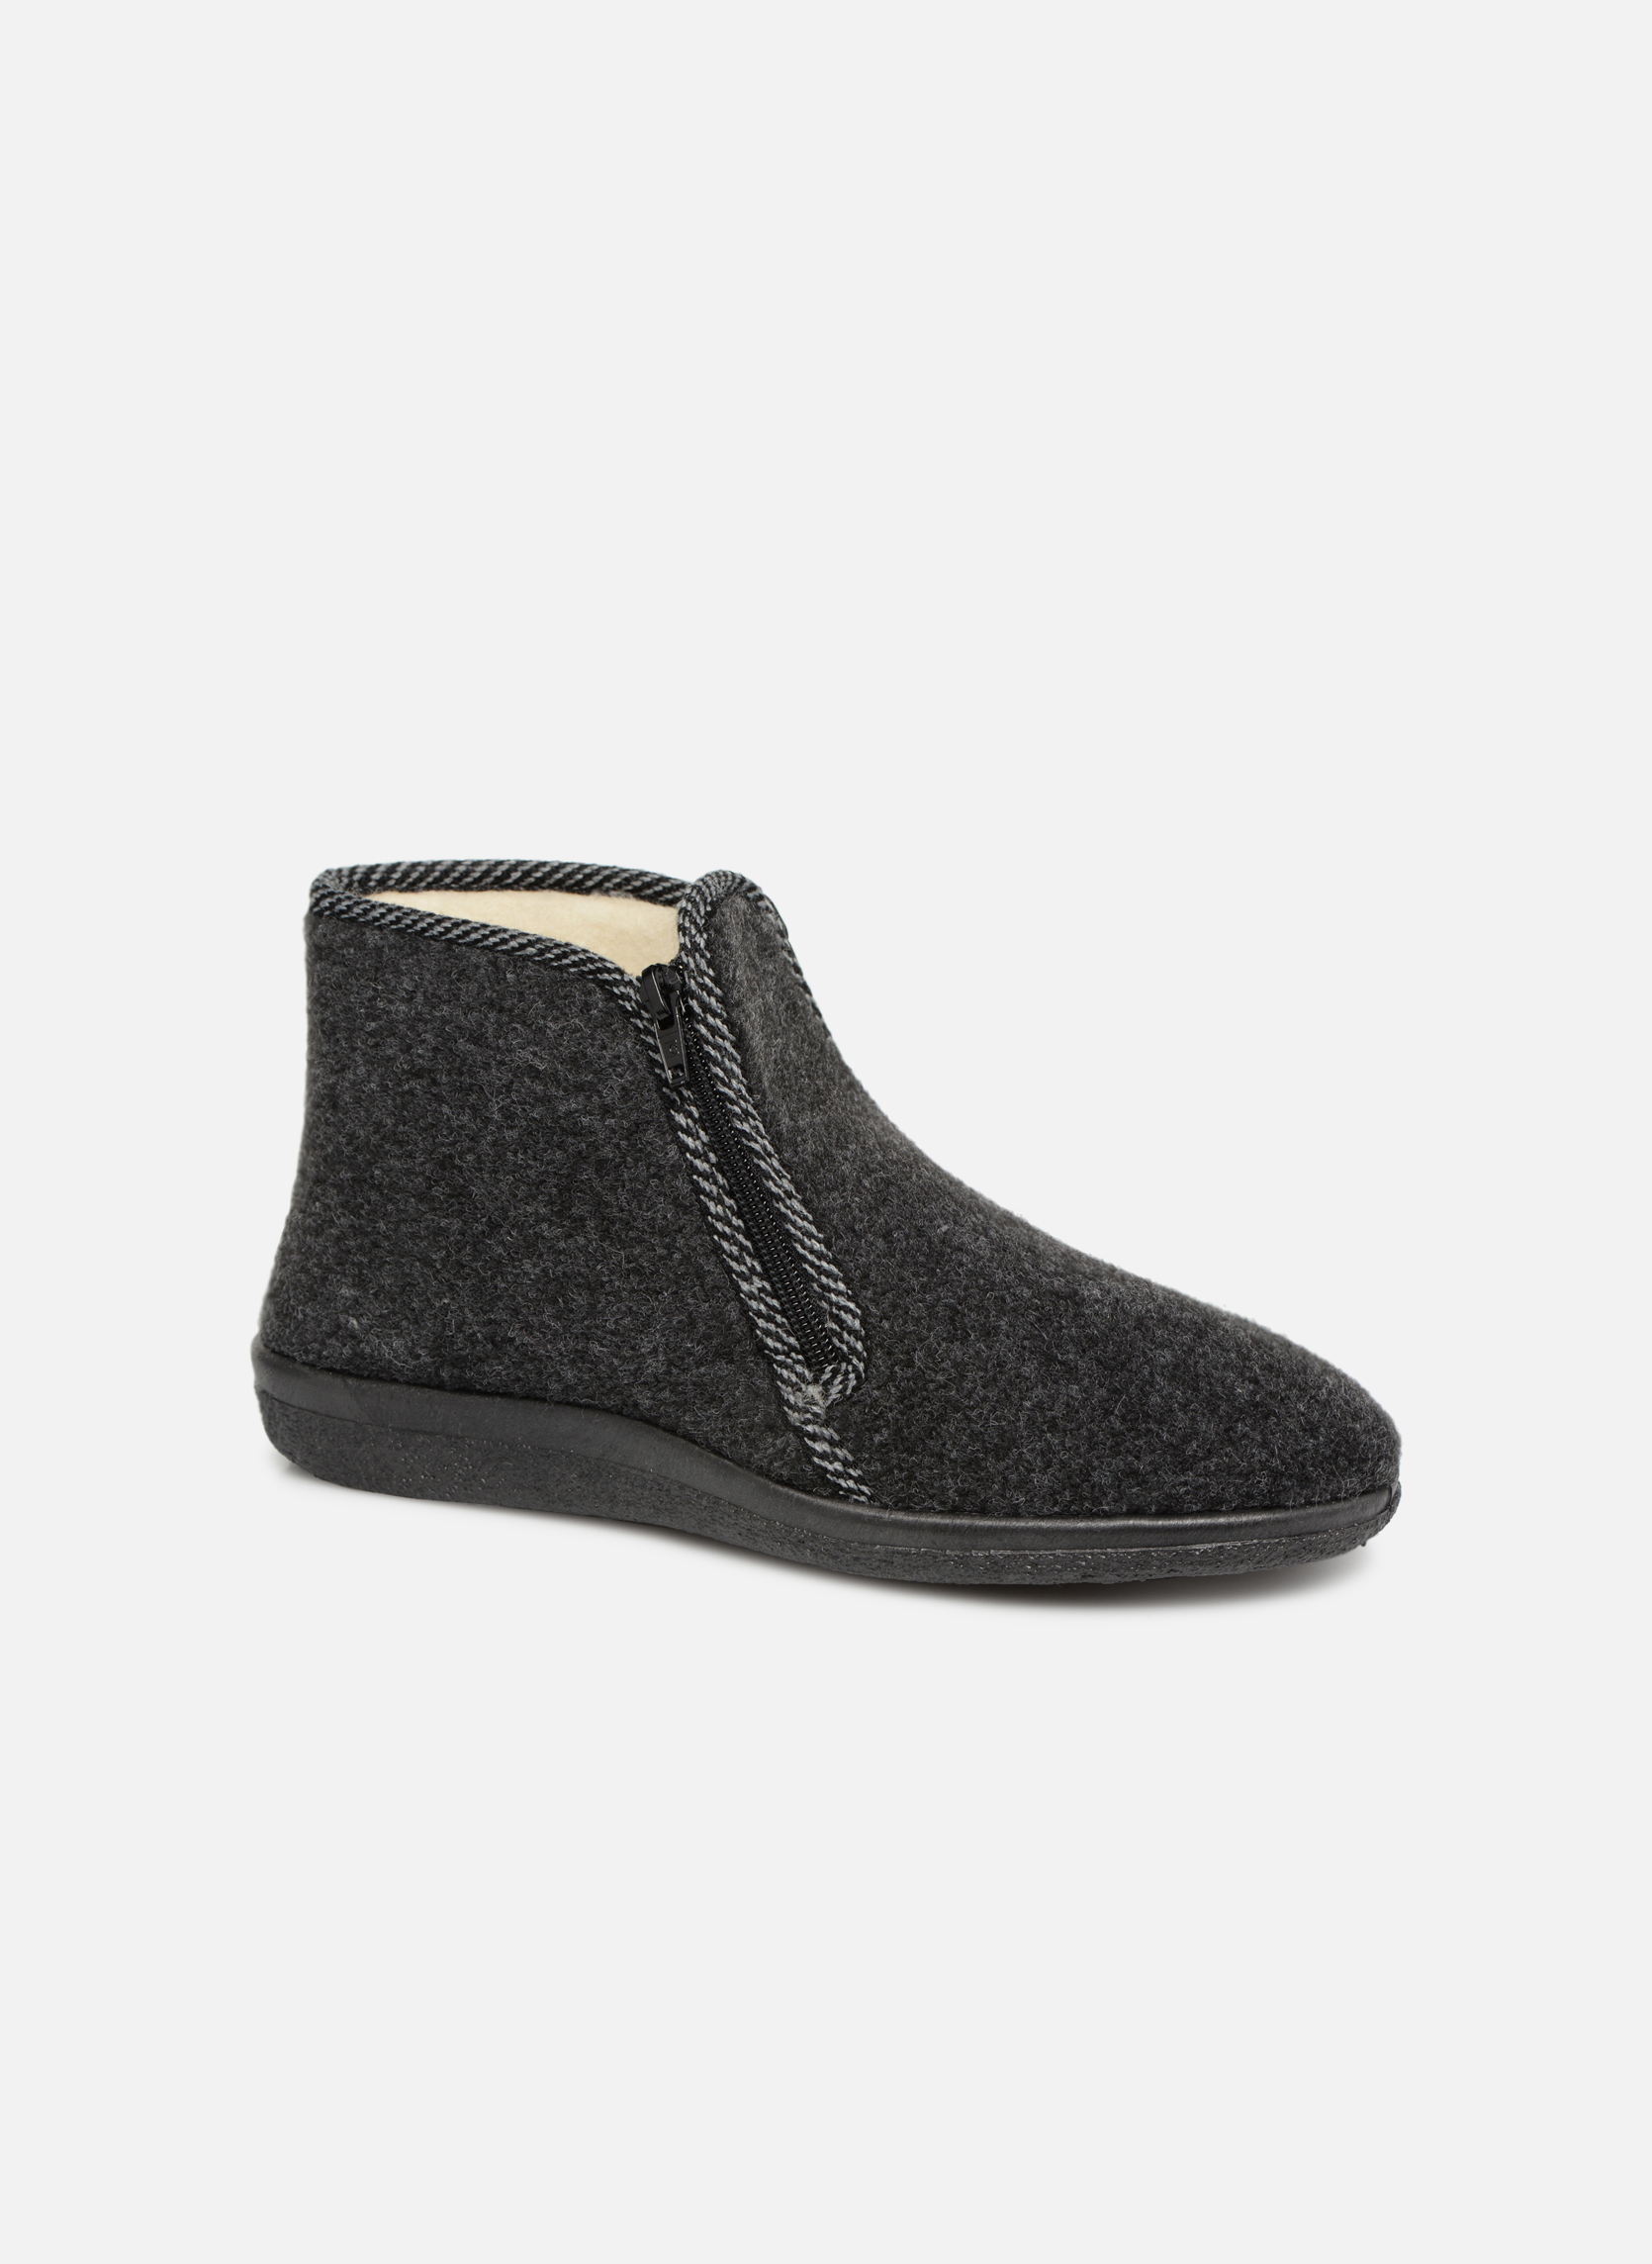 Pantoffels Heren Gaillard